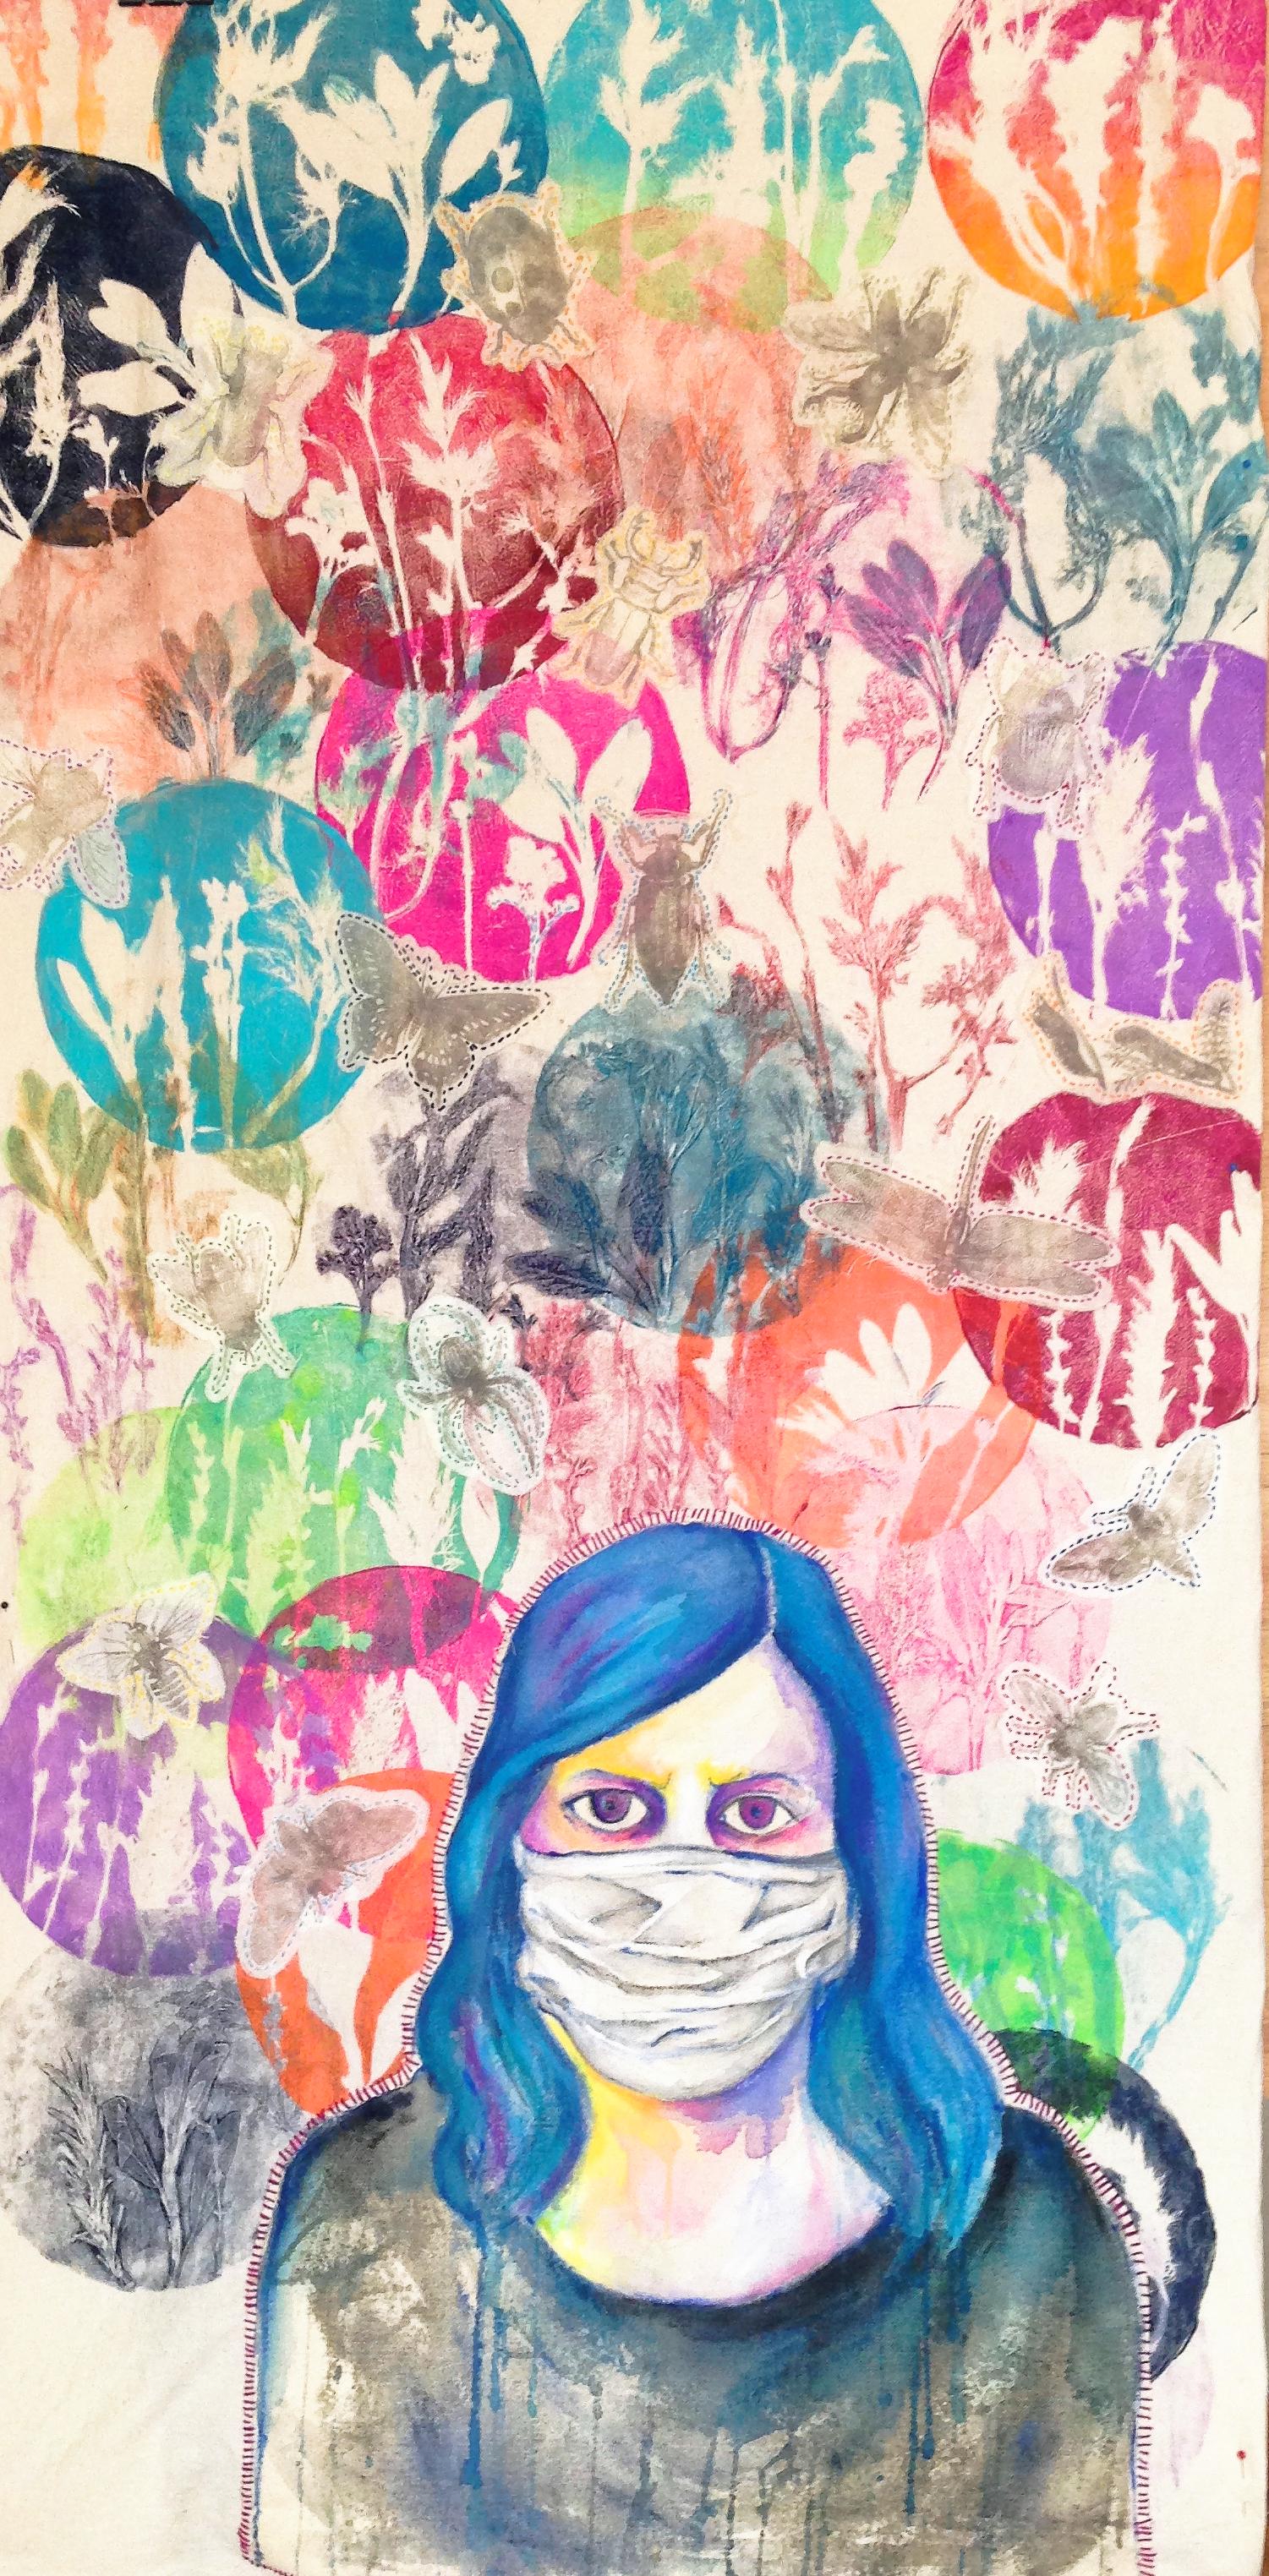 Self-portrait Emerging From Illness